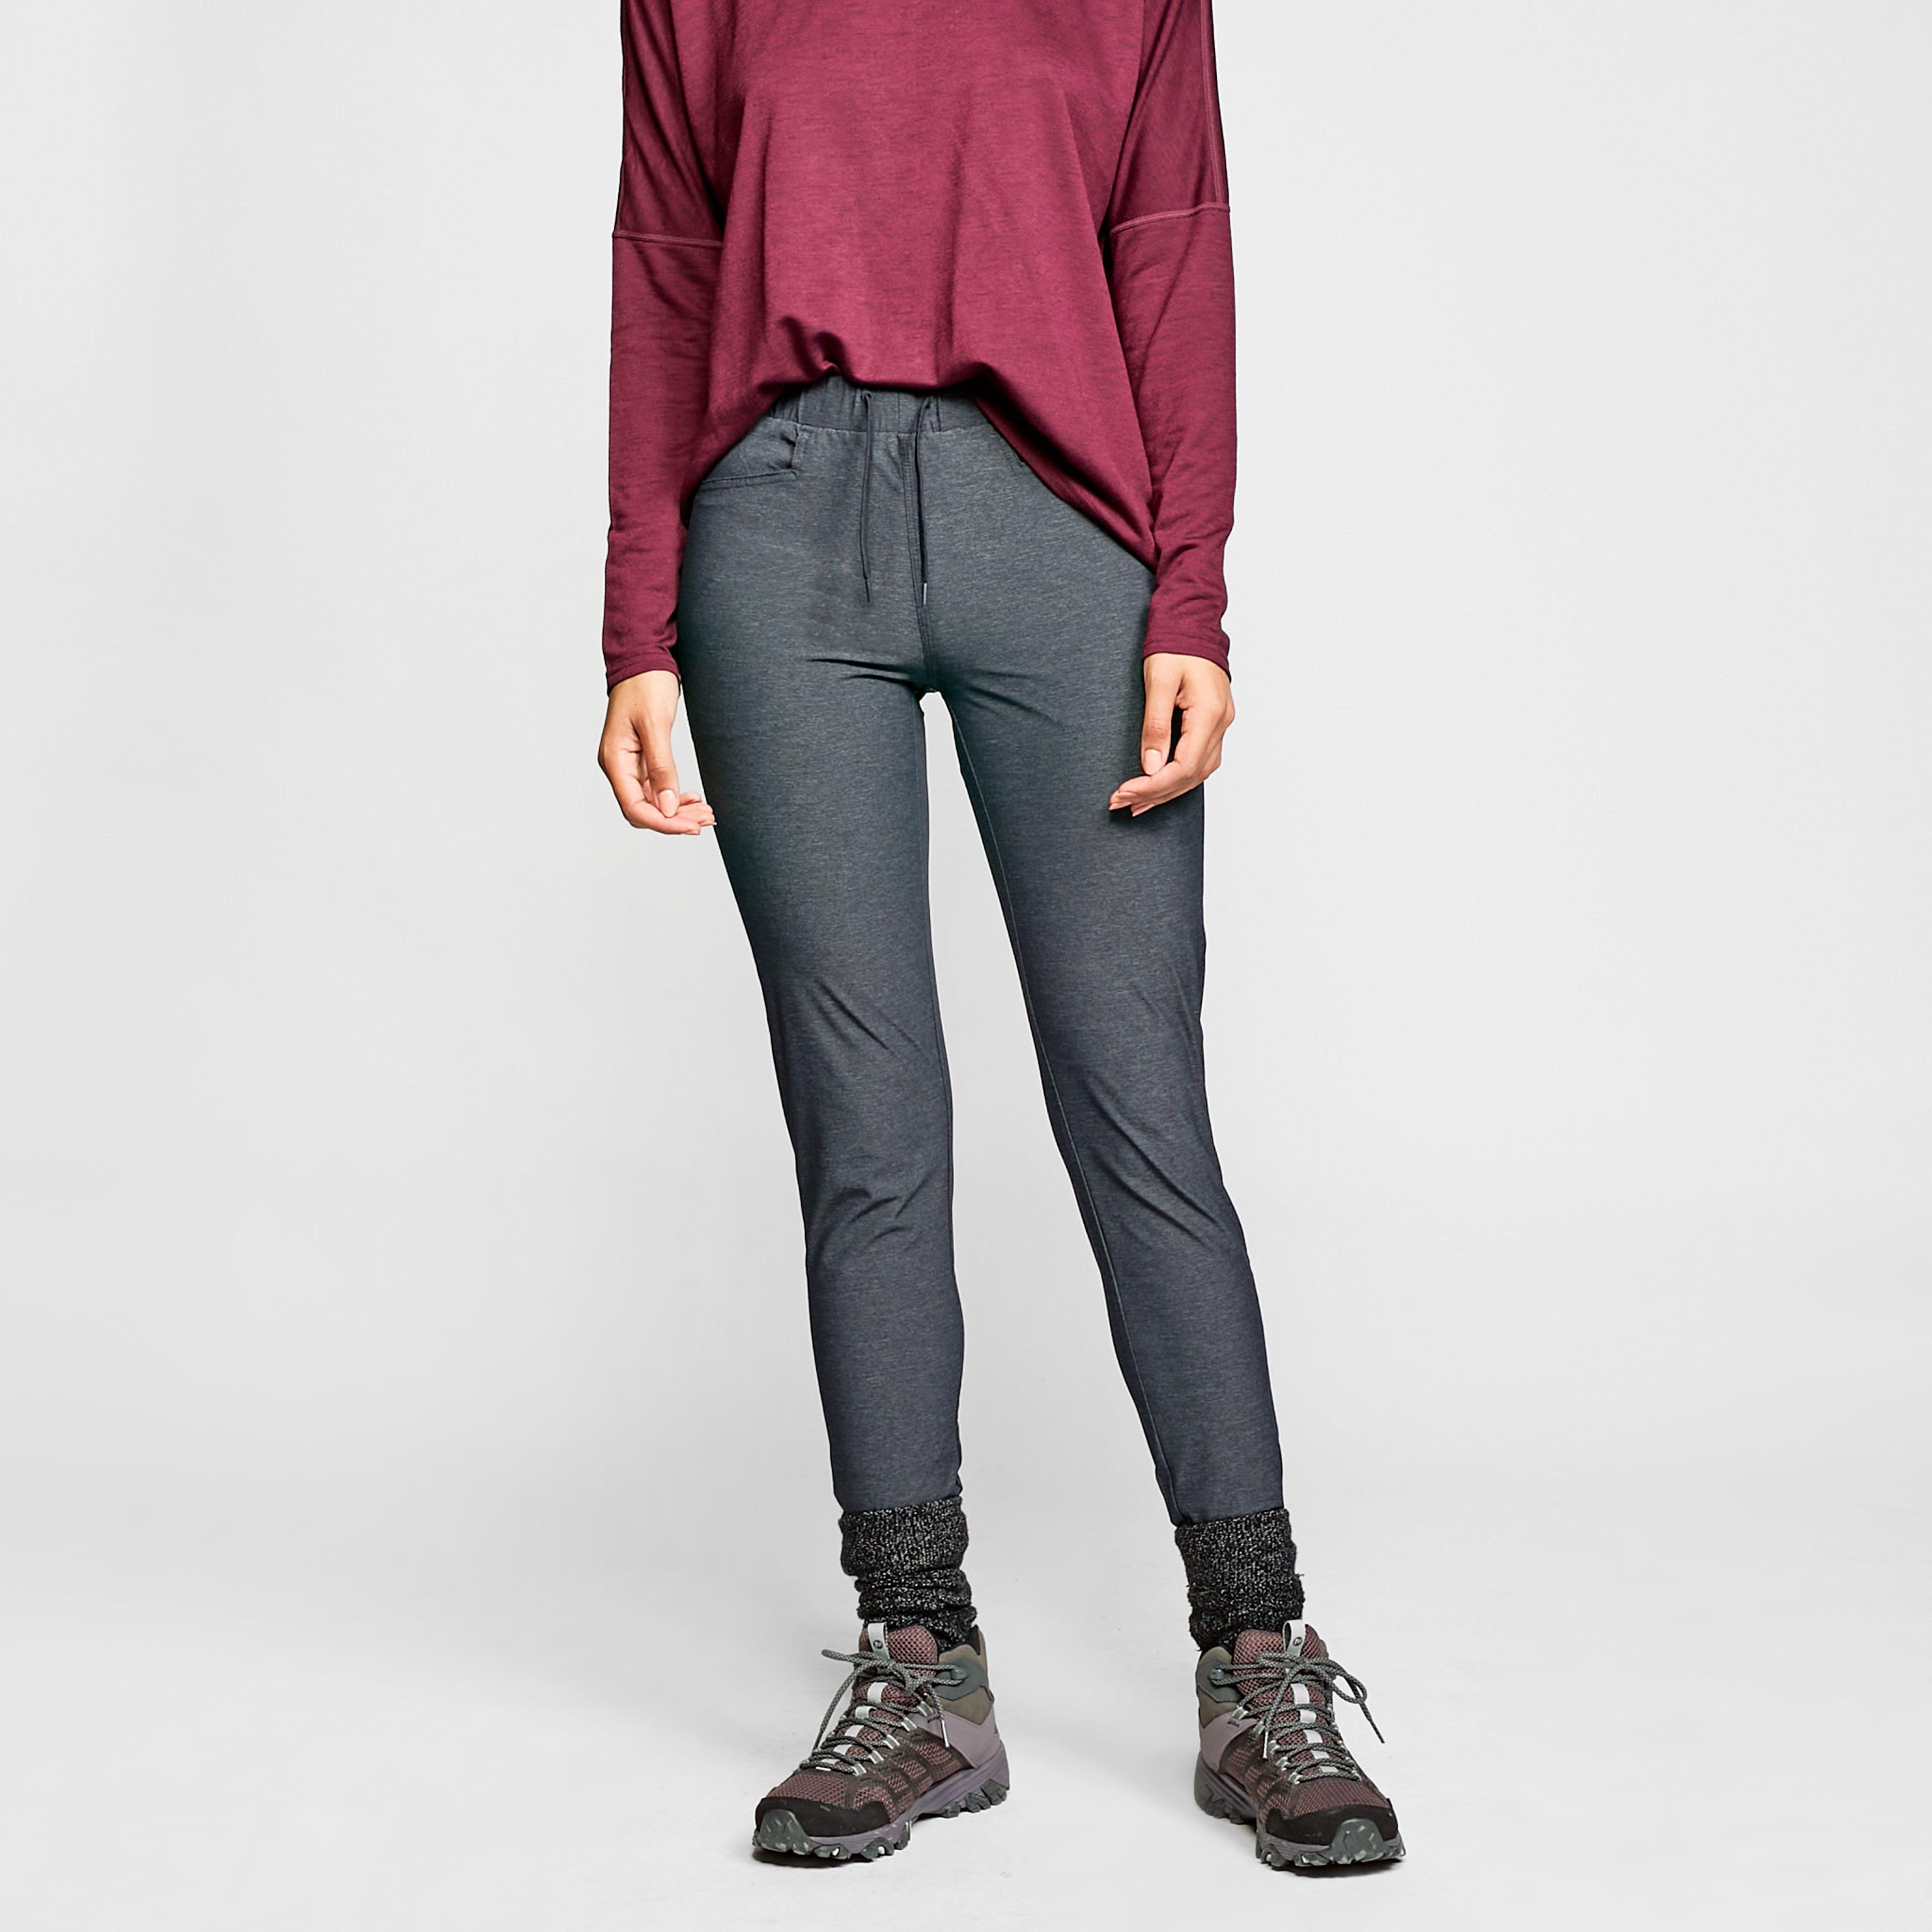 New North Ridge Women's Vitality Trousers